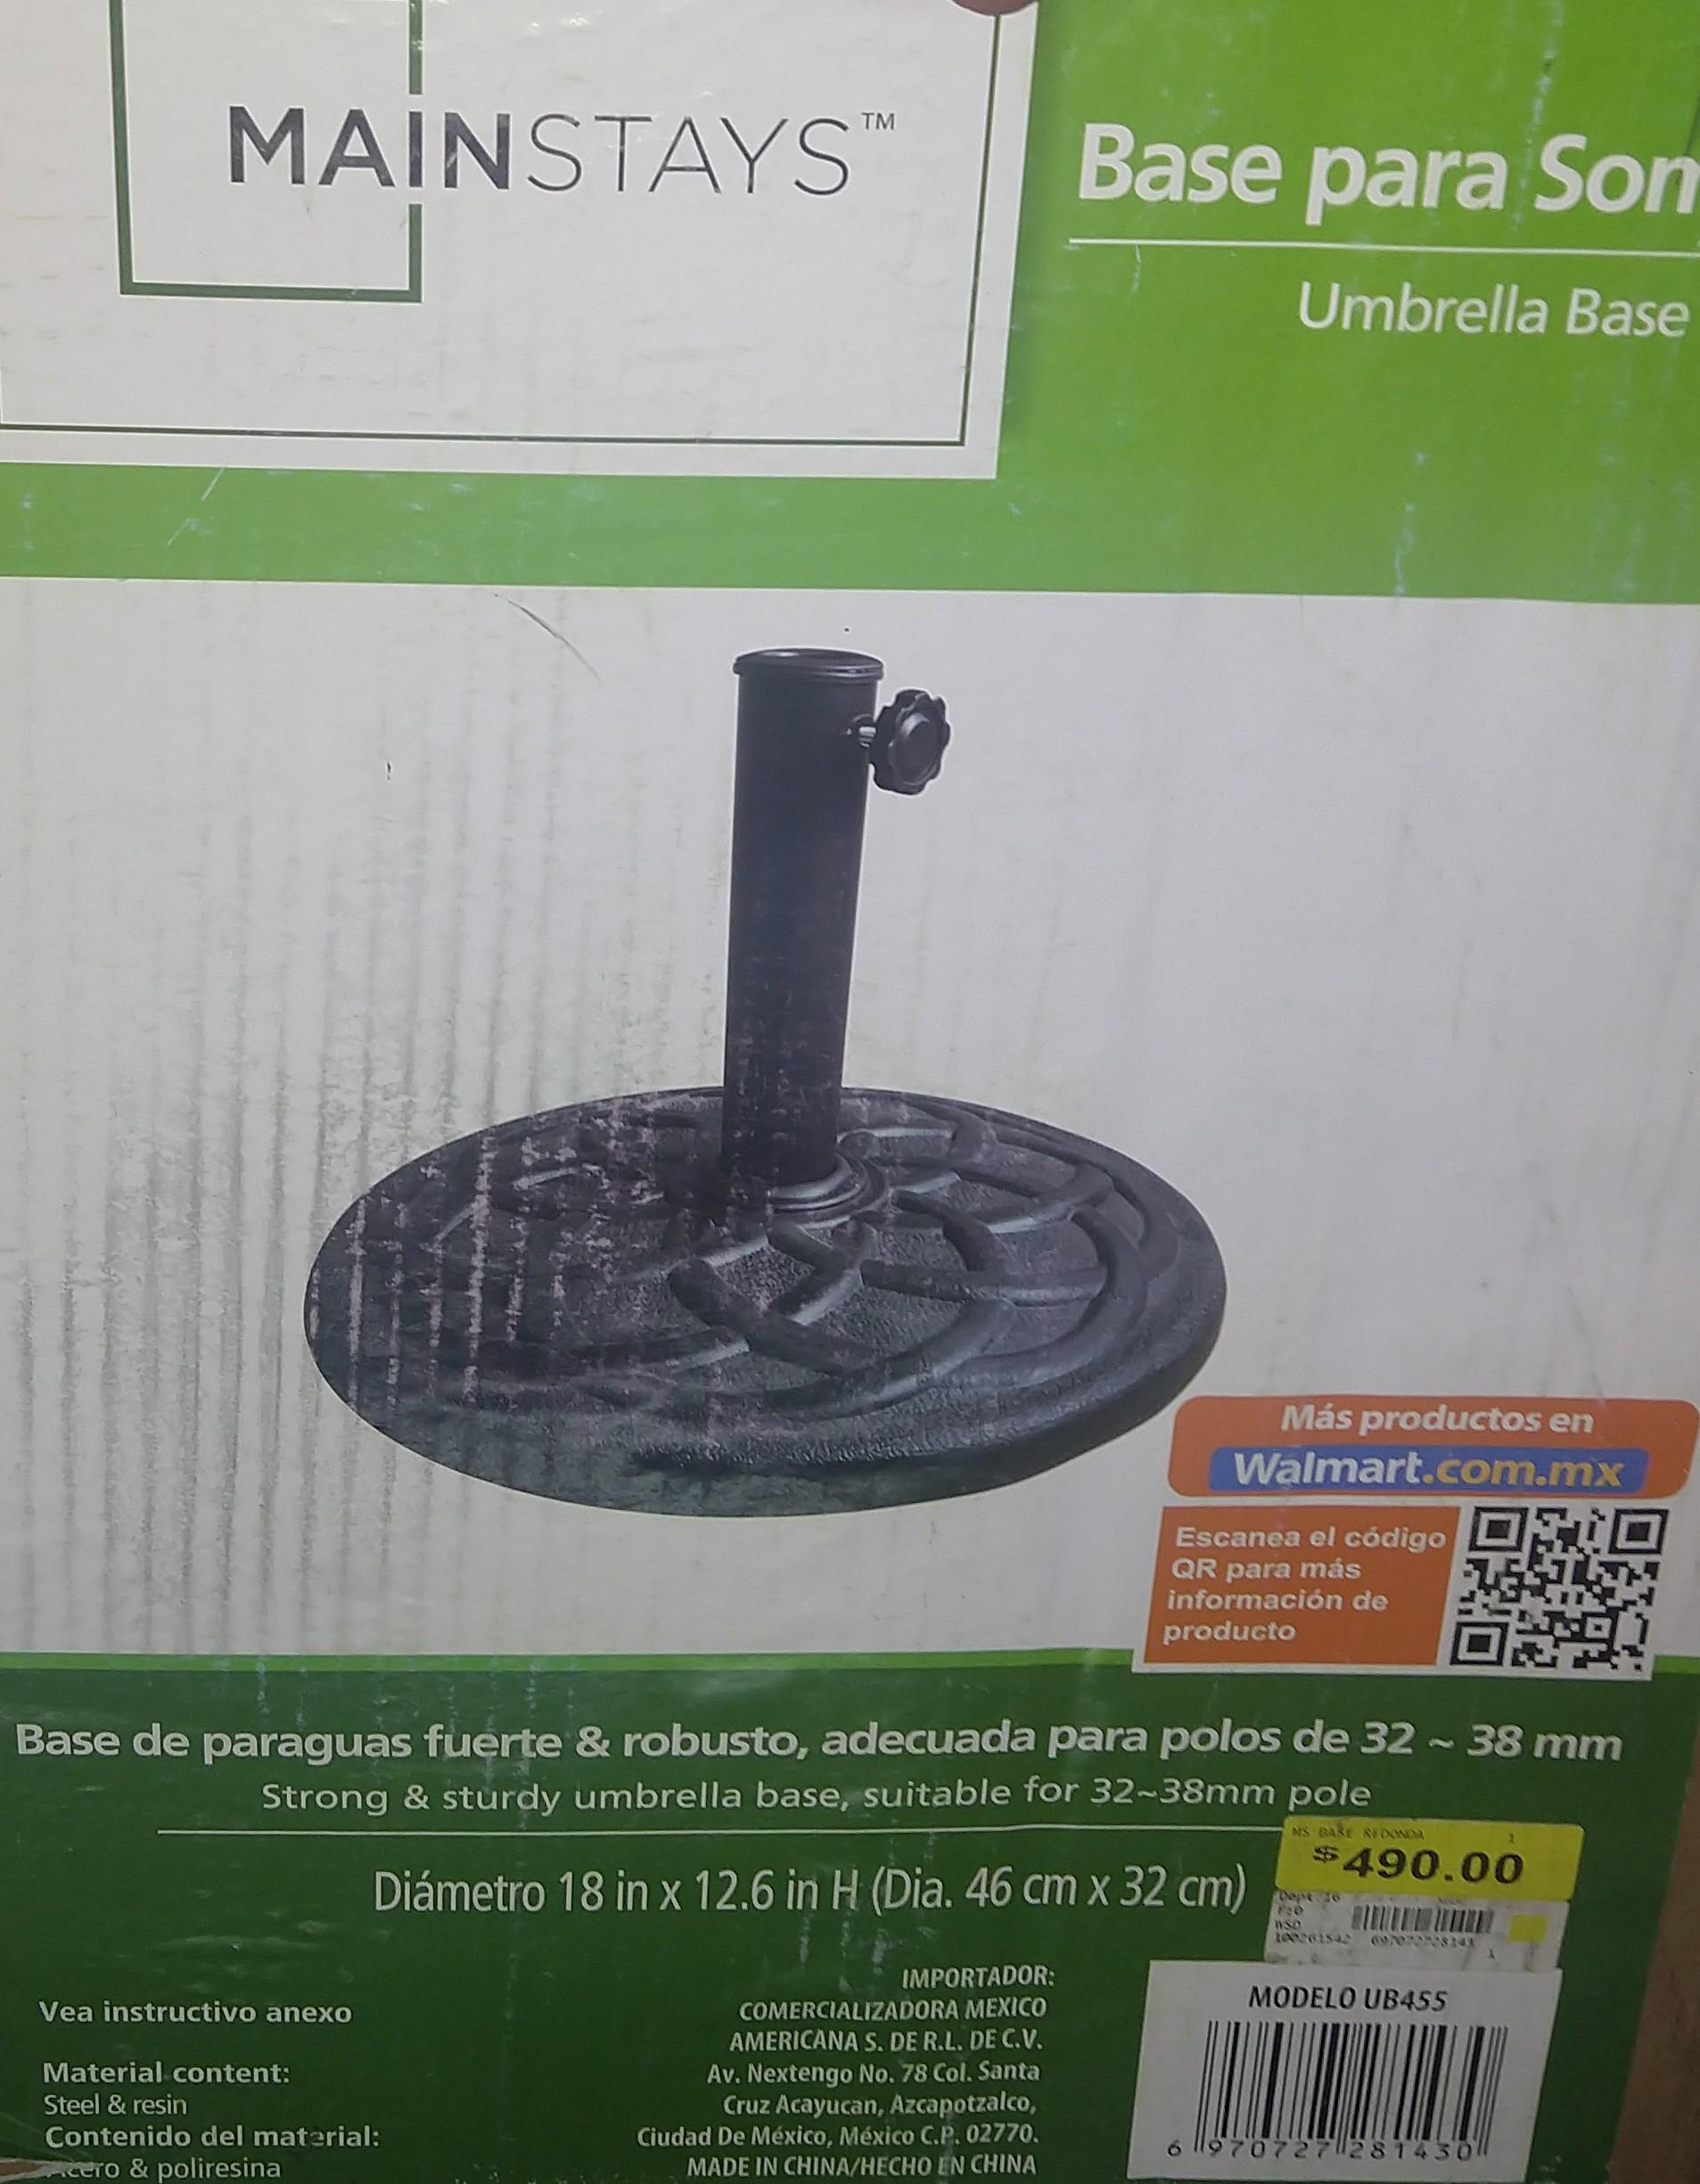 Walmart : Base para sombrilla 99.03